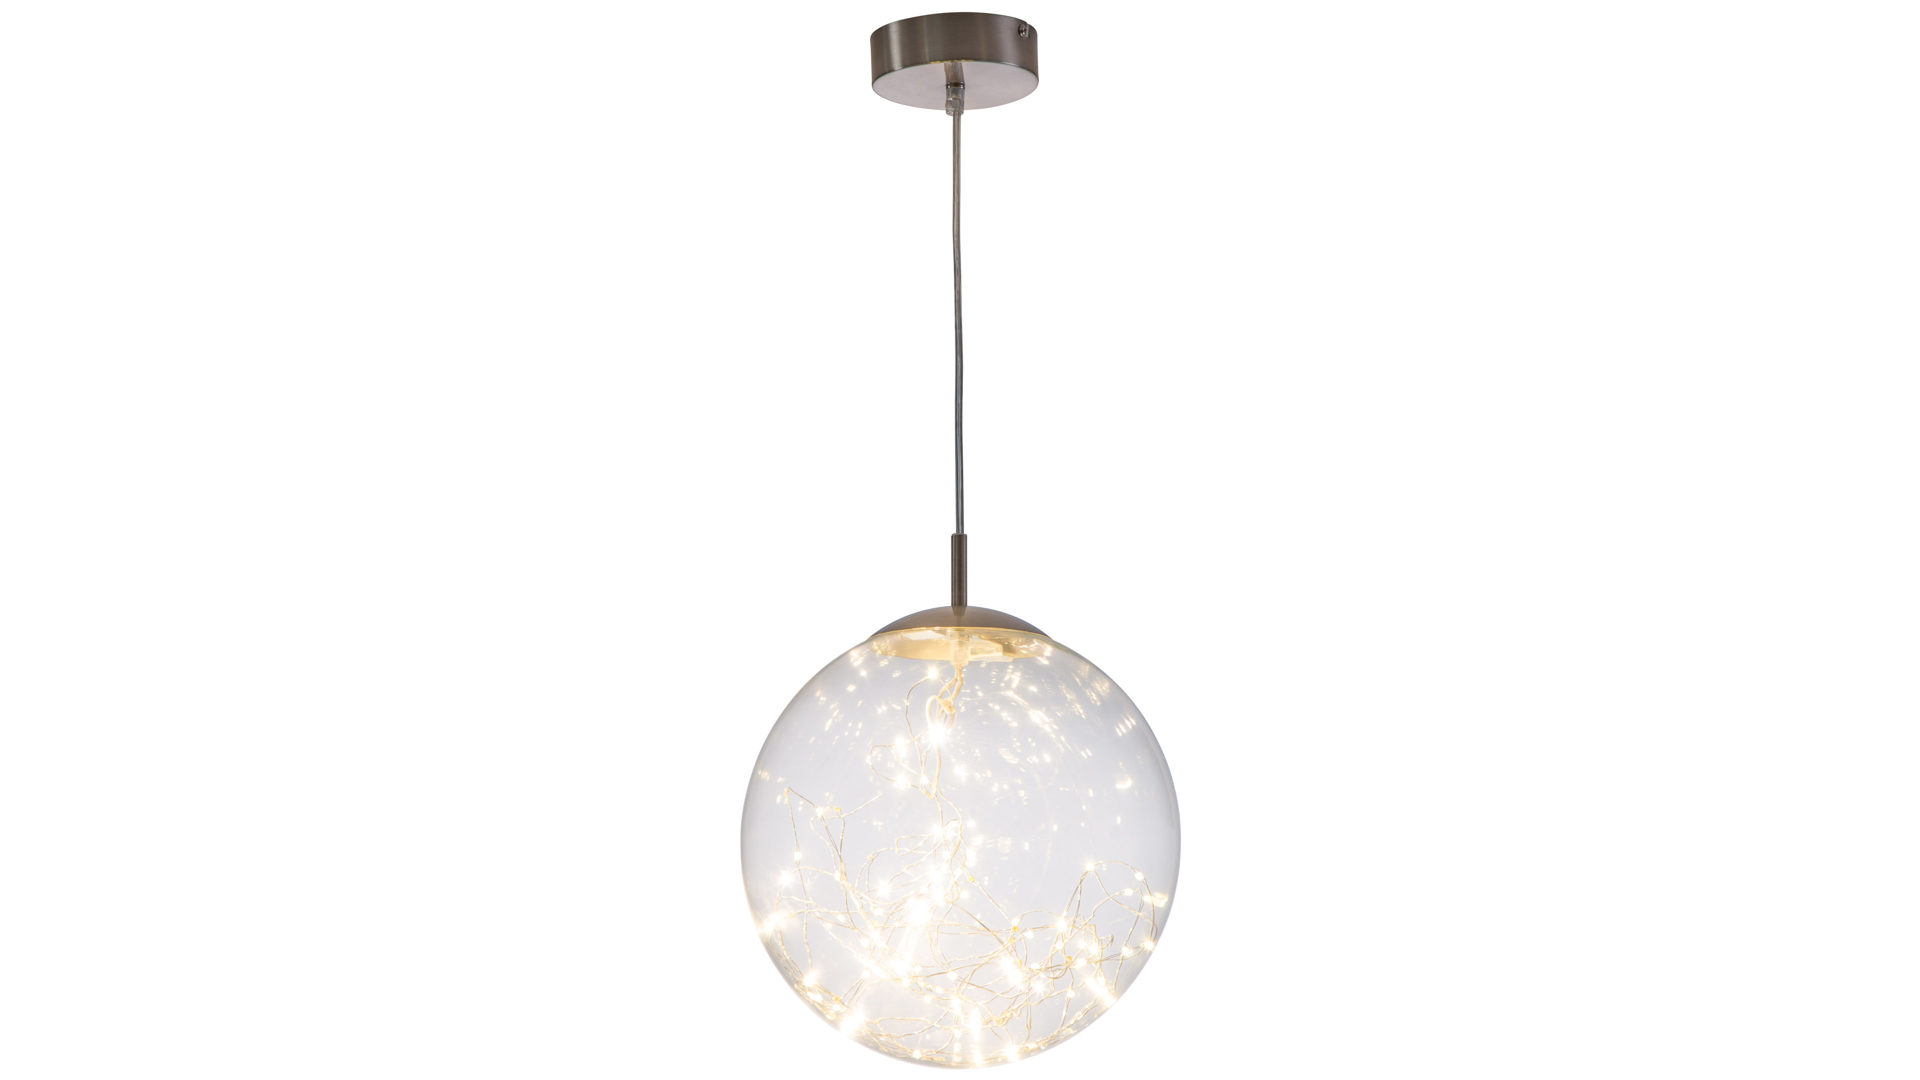 Mobel Bernskotter Mulheim Raume Esszimmer Lampen Leuchten Led